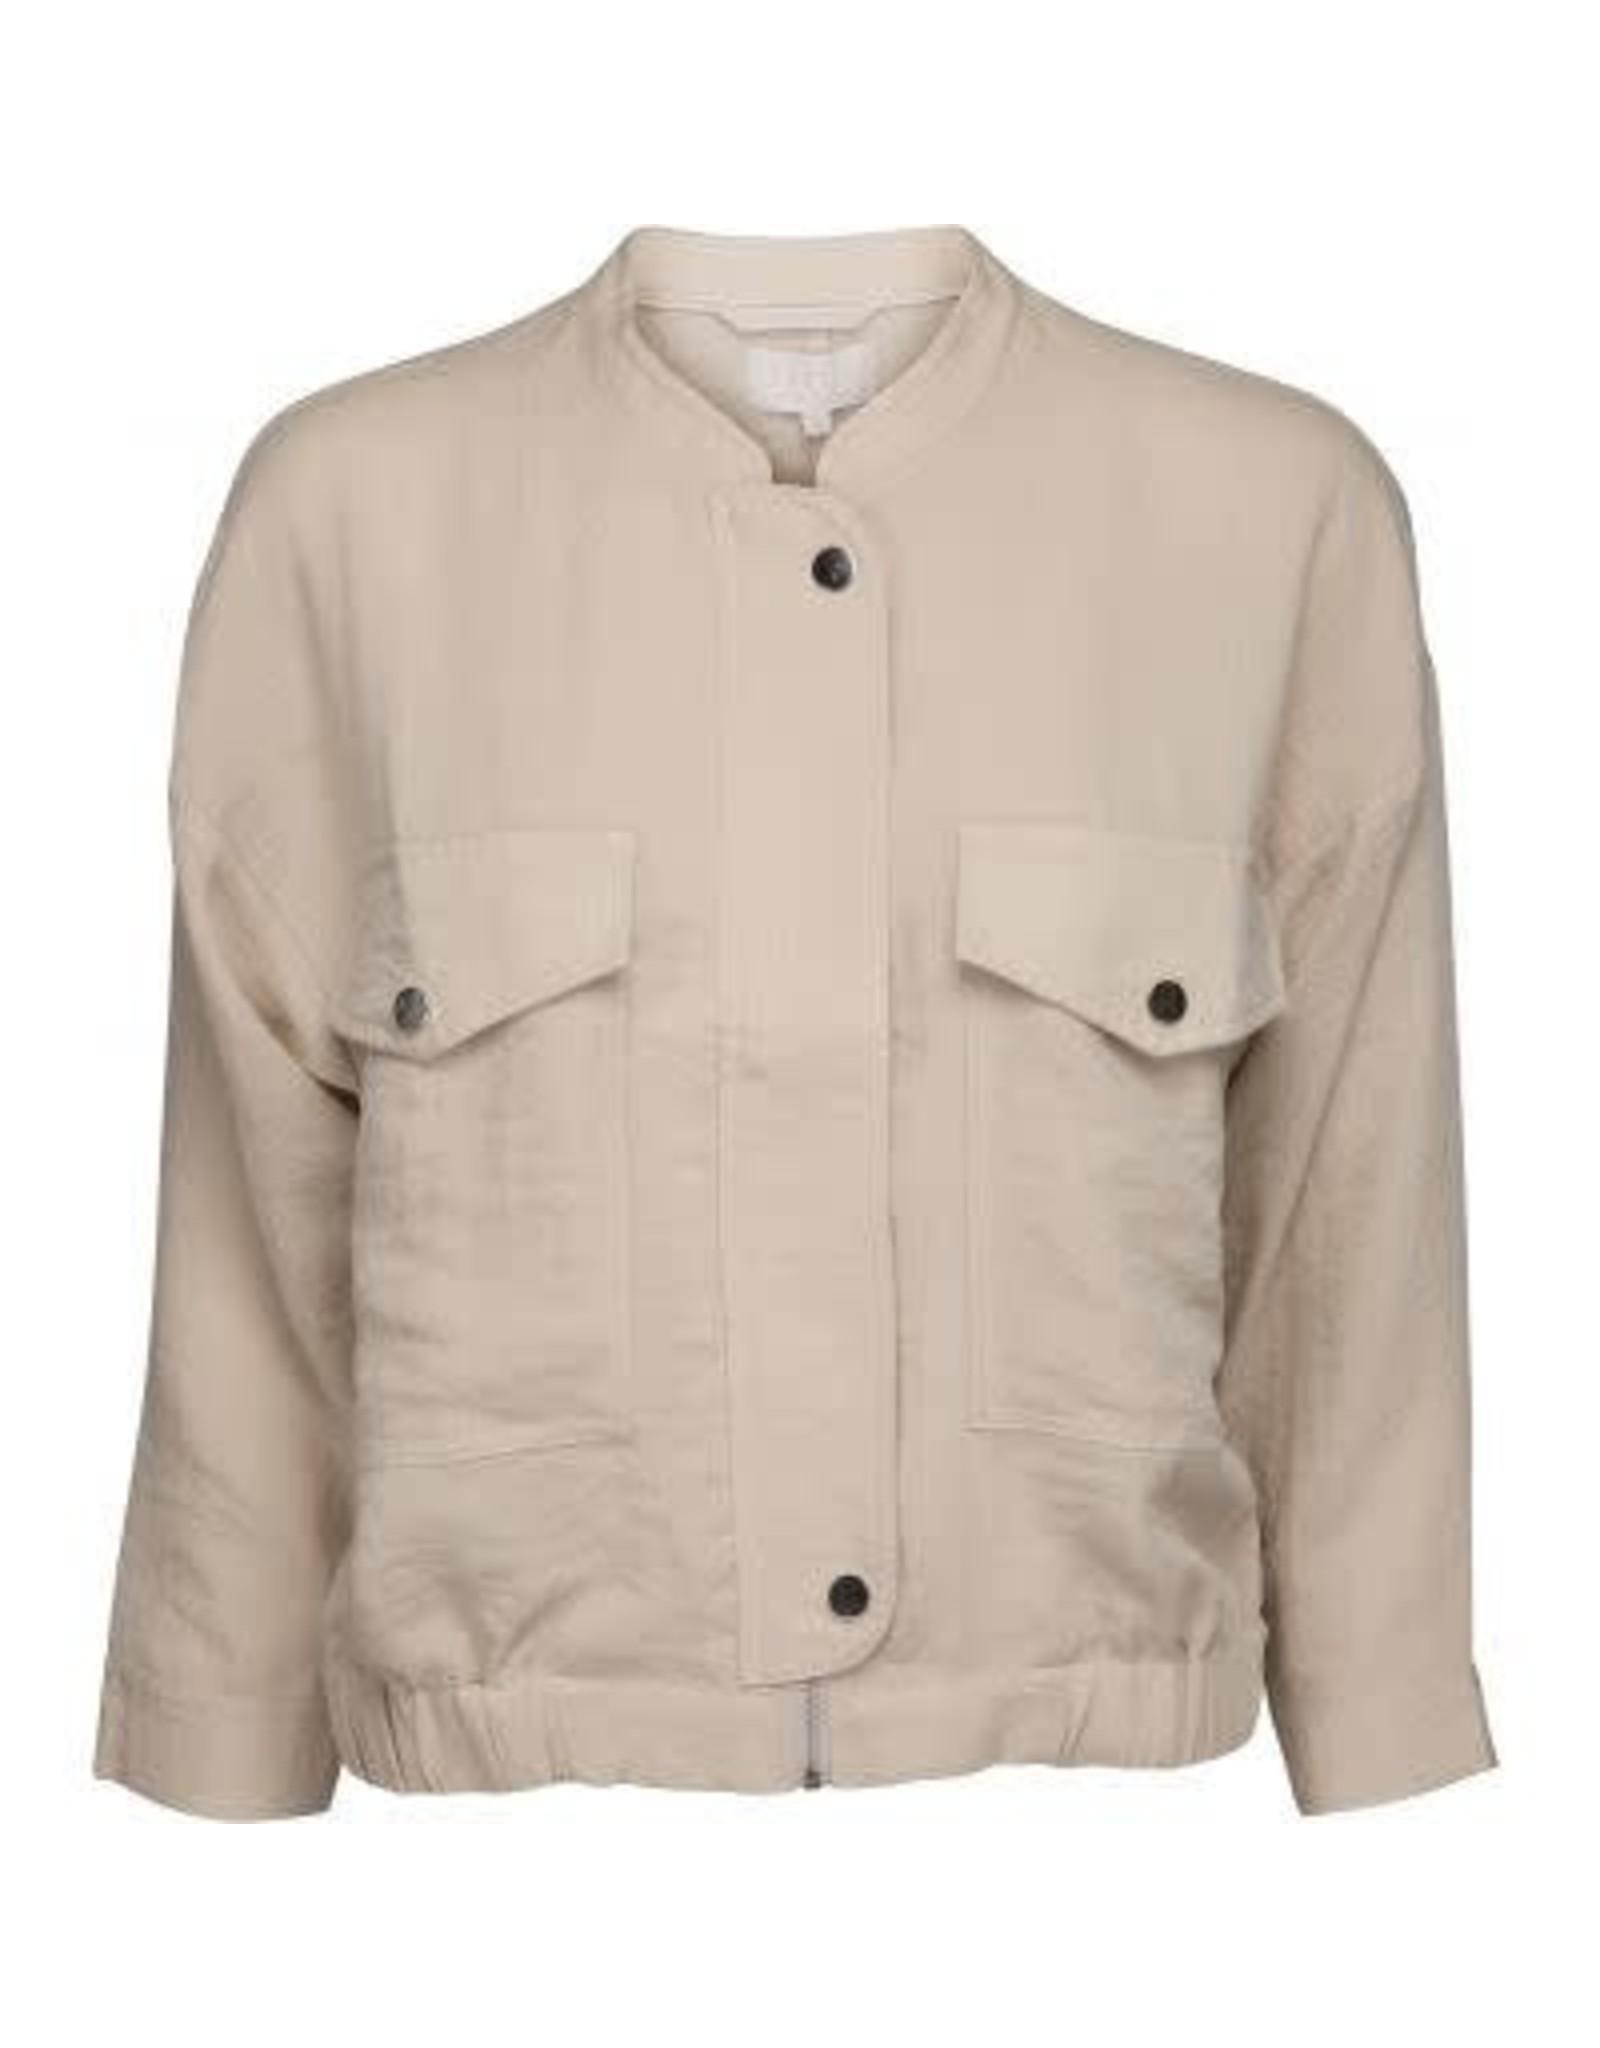 Minus Melanie jacket